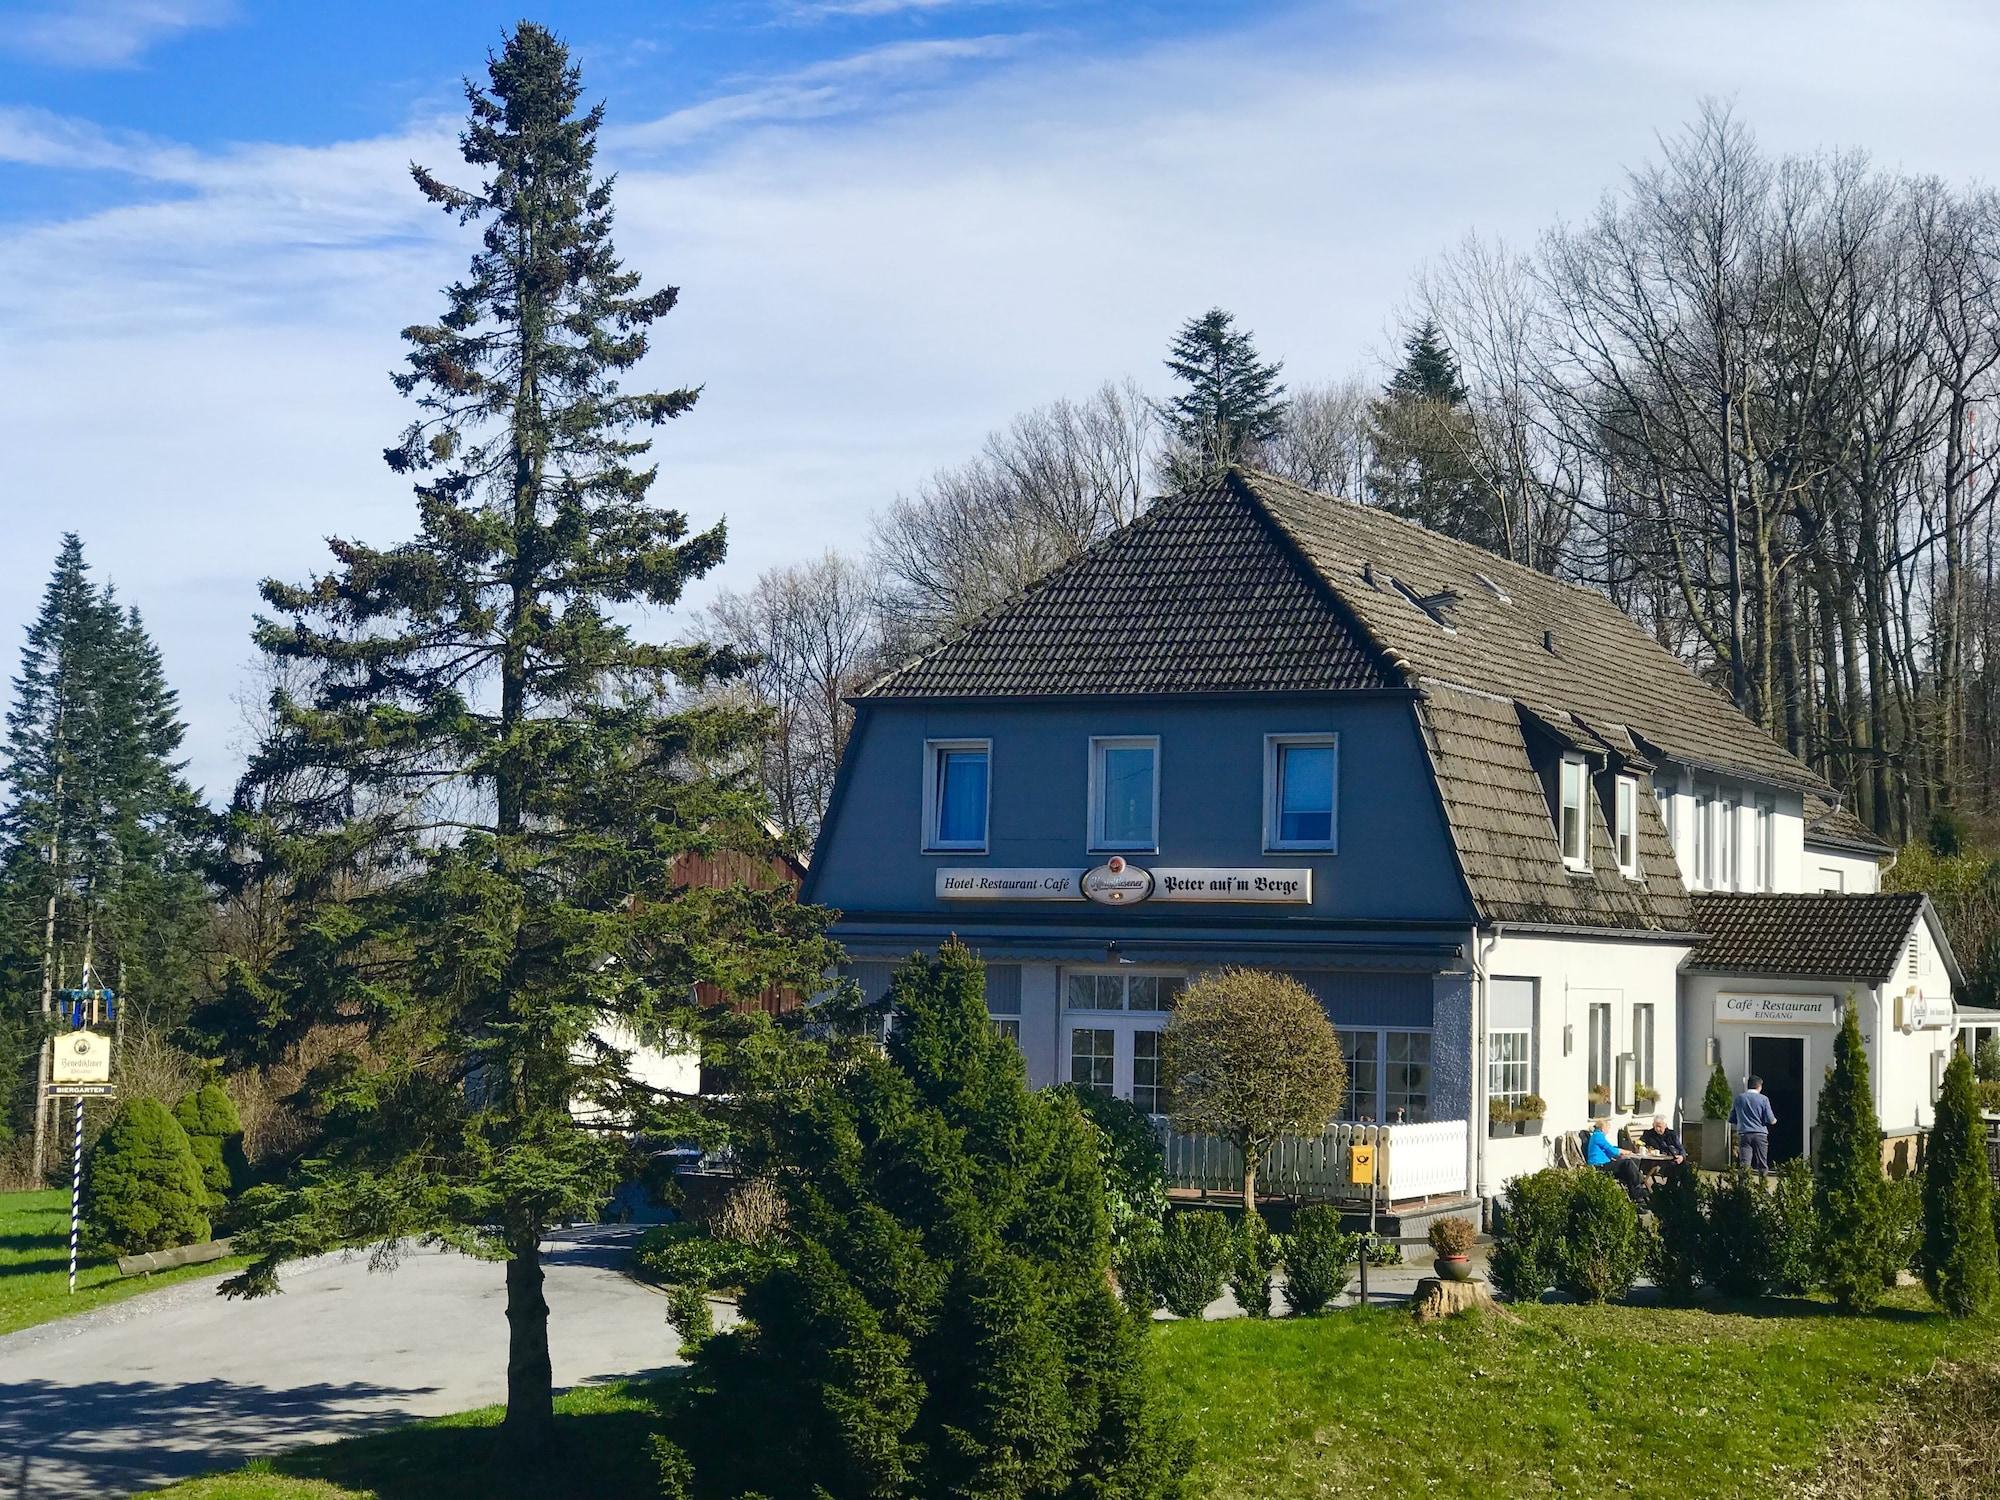 Waldhotel Peter aufm Berge, Bielefeld